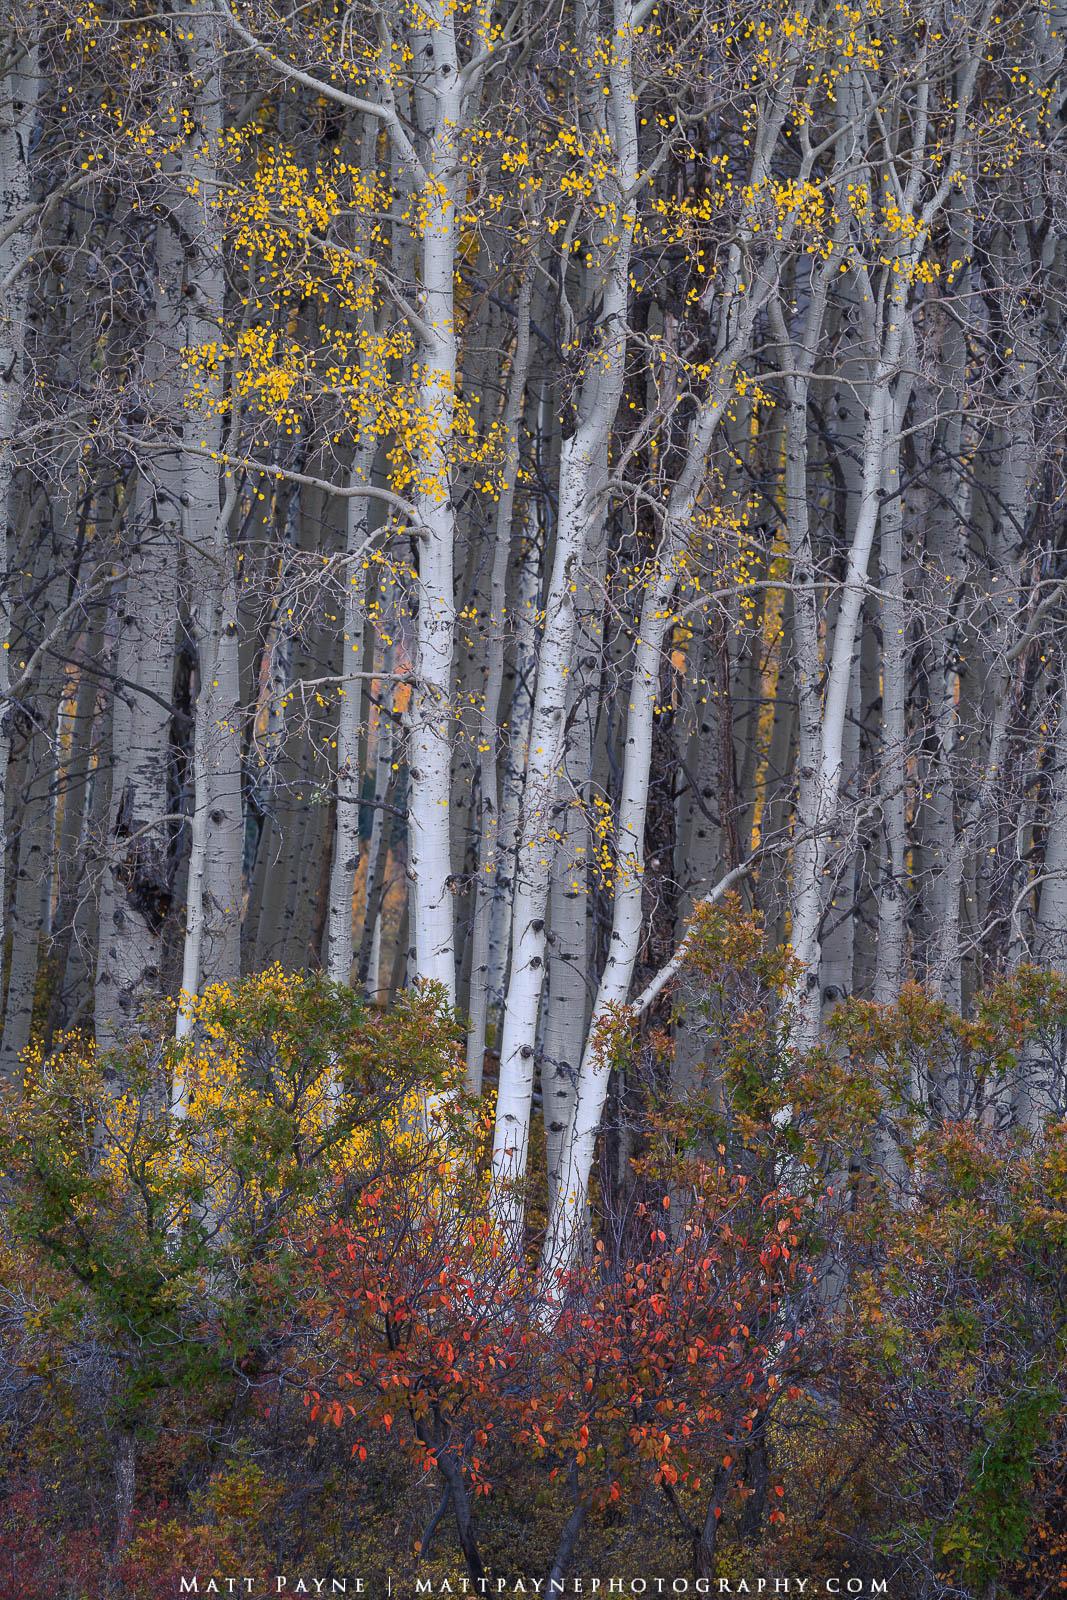 Aspen Trees, Autumn, Colorado, Fall, Fall Colors, Foliage, Landscape, San Juan Mountains, aspen leaves, colorful, landscape photography, photo